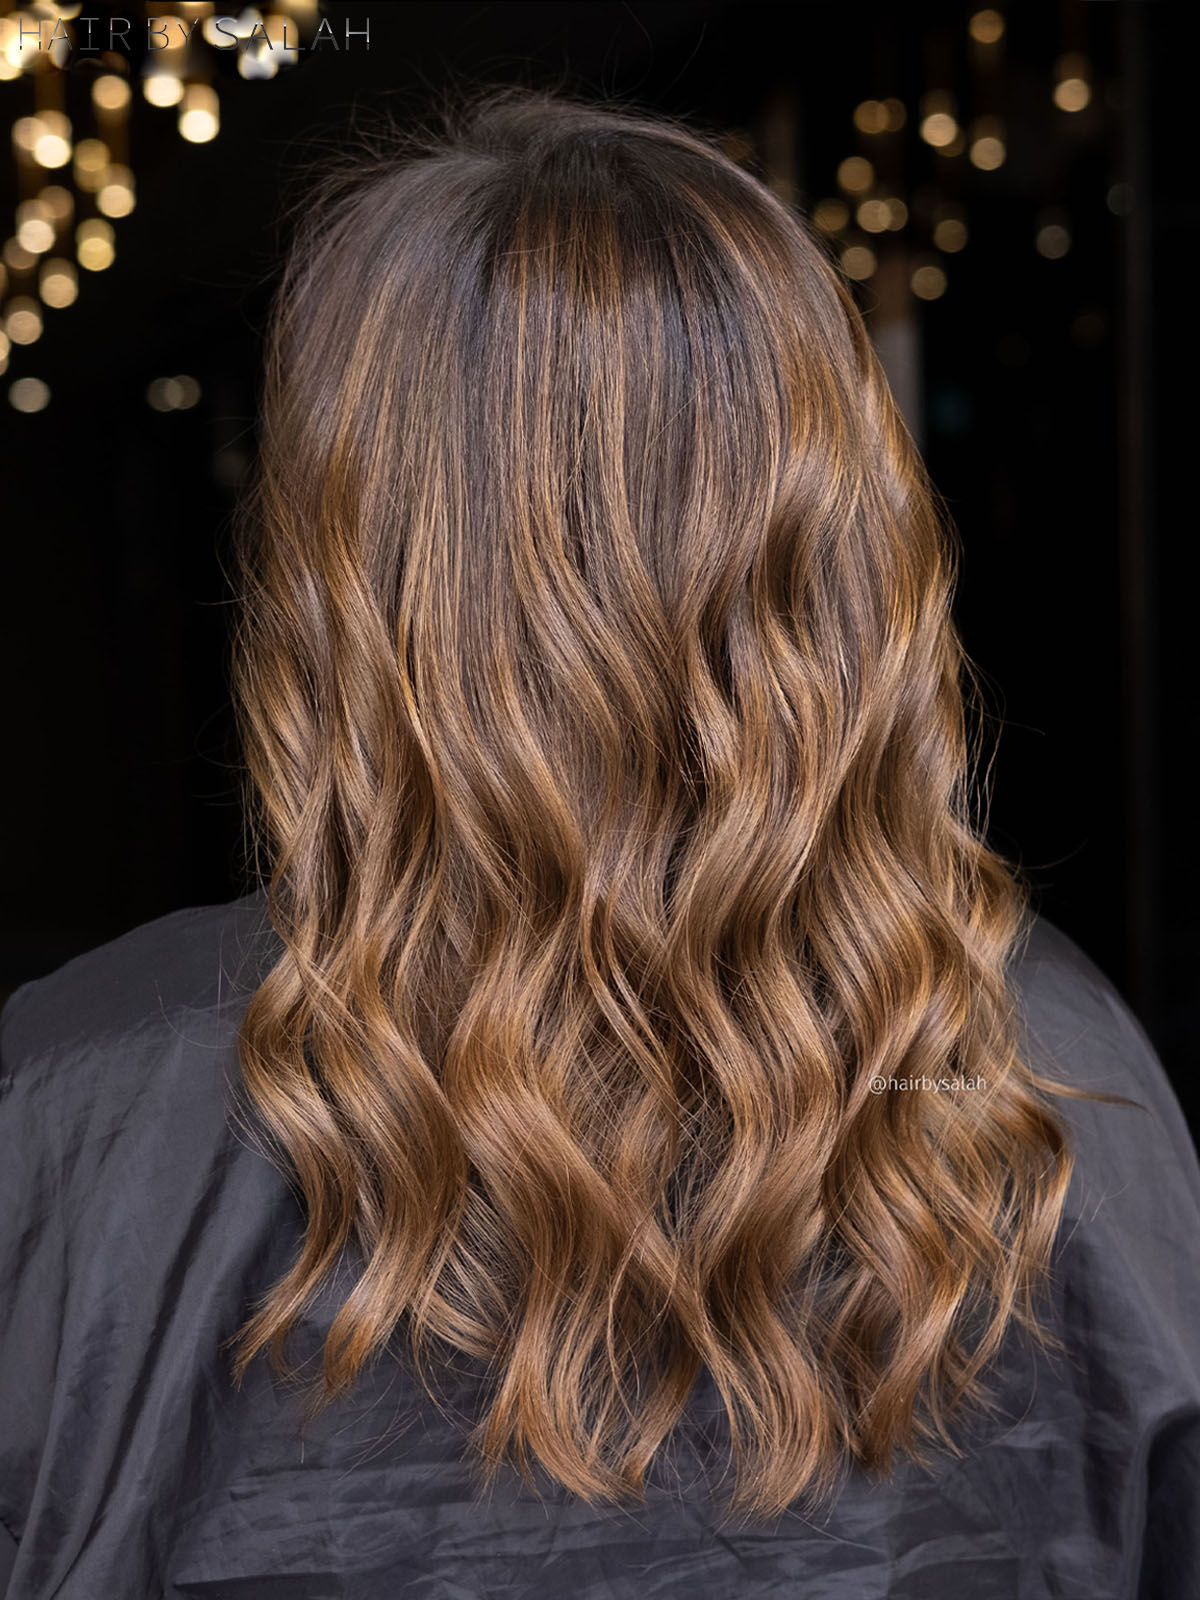 Melted Honey Brown Balayage by Salah & Hair Creators Color Team. #honeyhair #honeygoldhair #balayaged